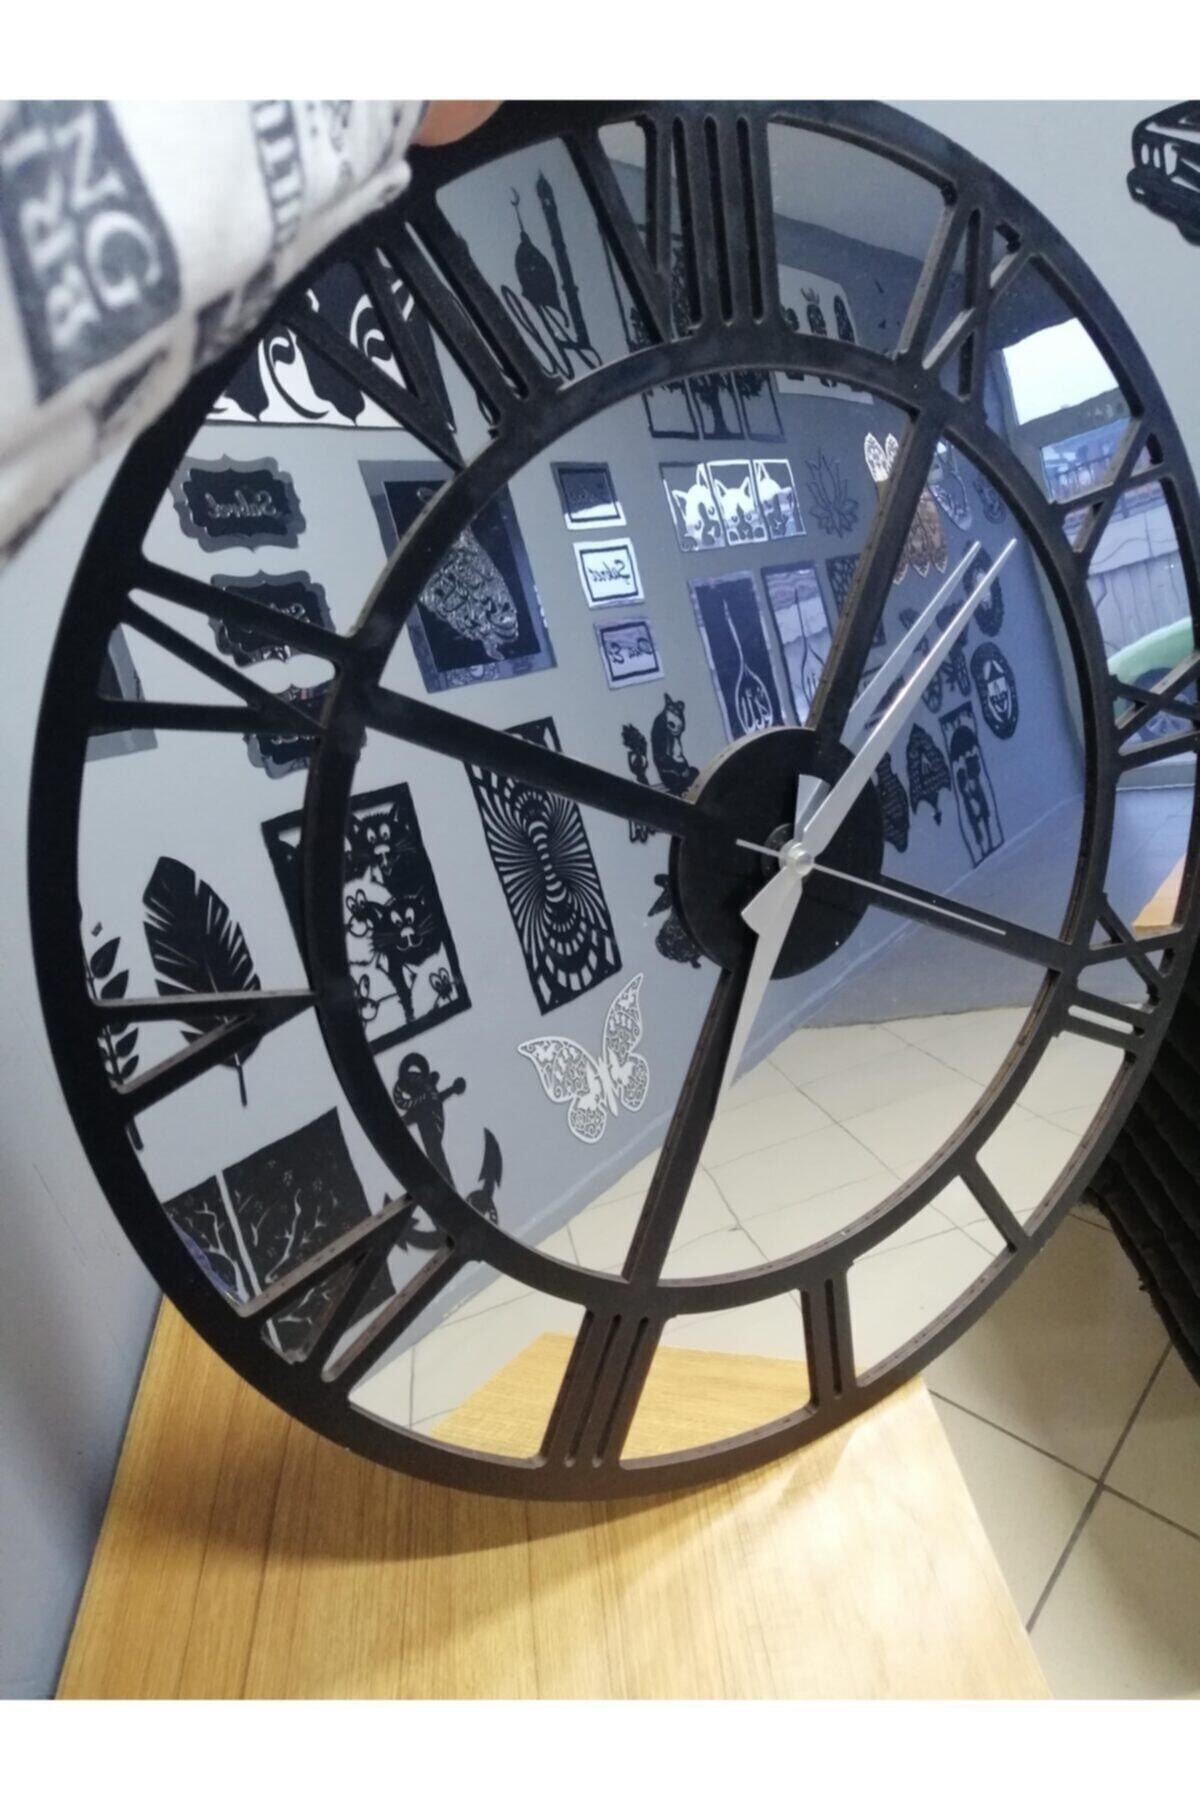 Gümüş Aynalı Pleksi & Siyah Ahşap Mdf Duvar Saati